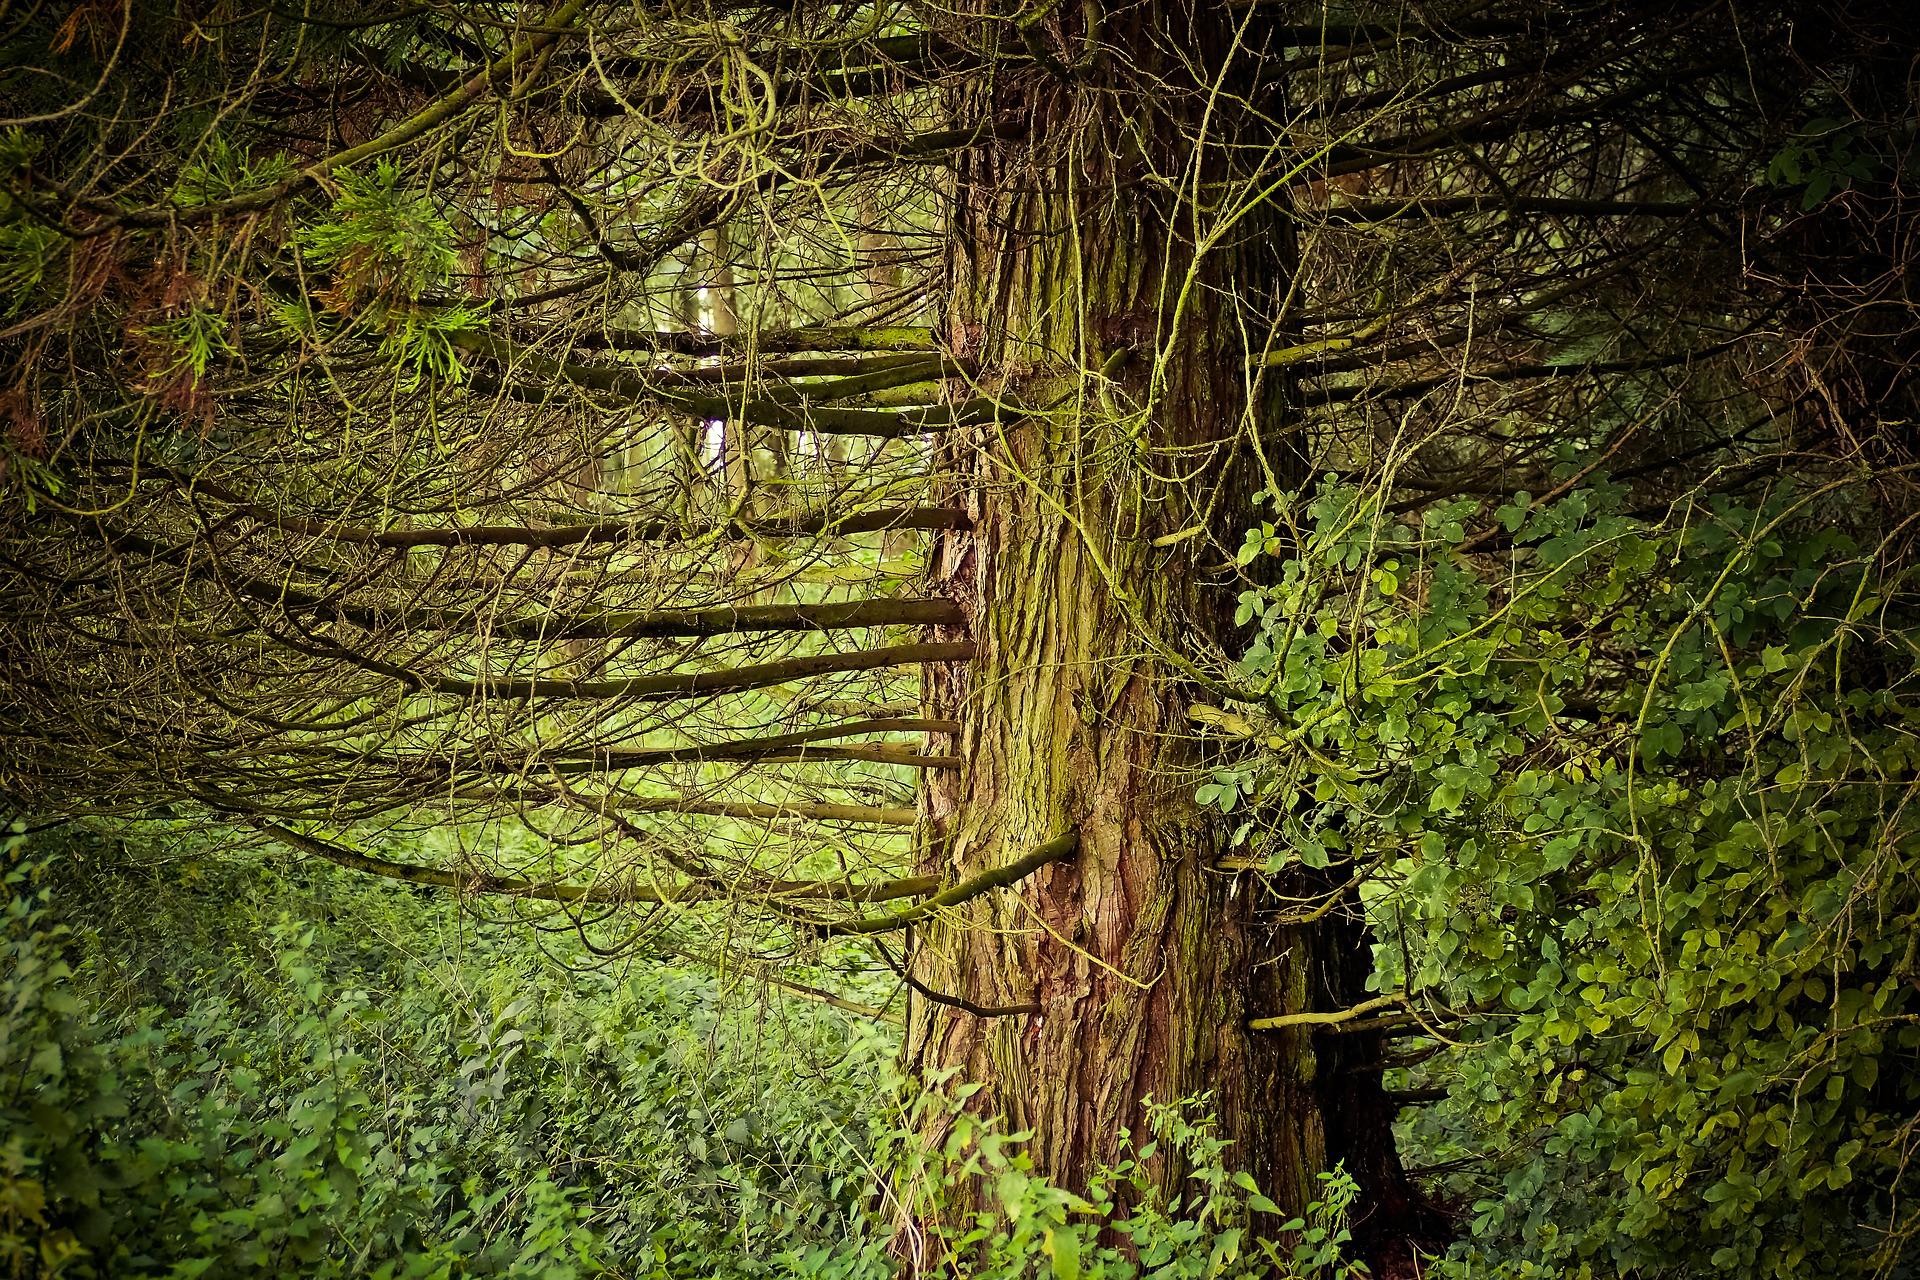 forest-2672042_1920.jpg